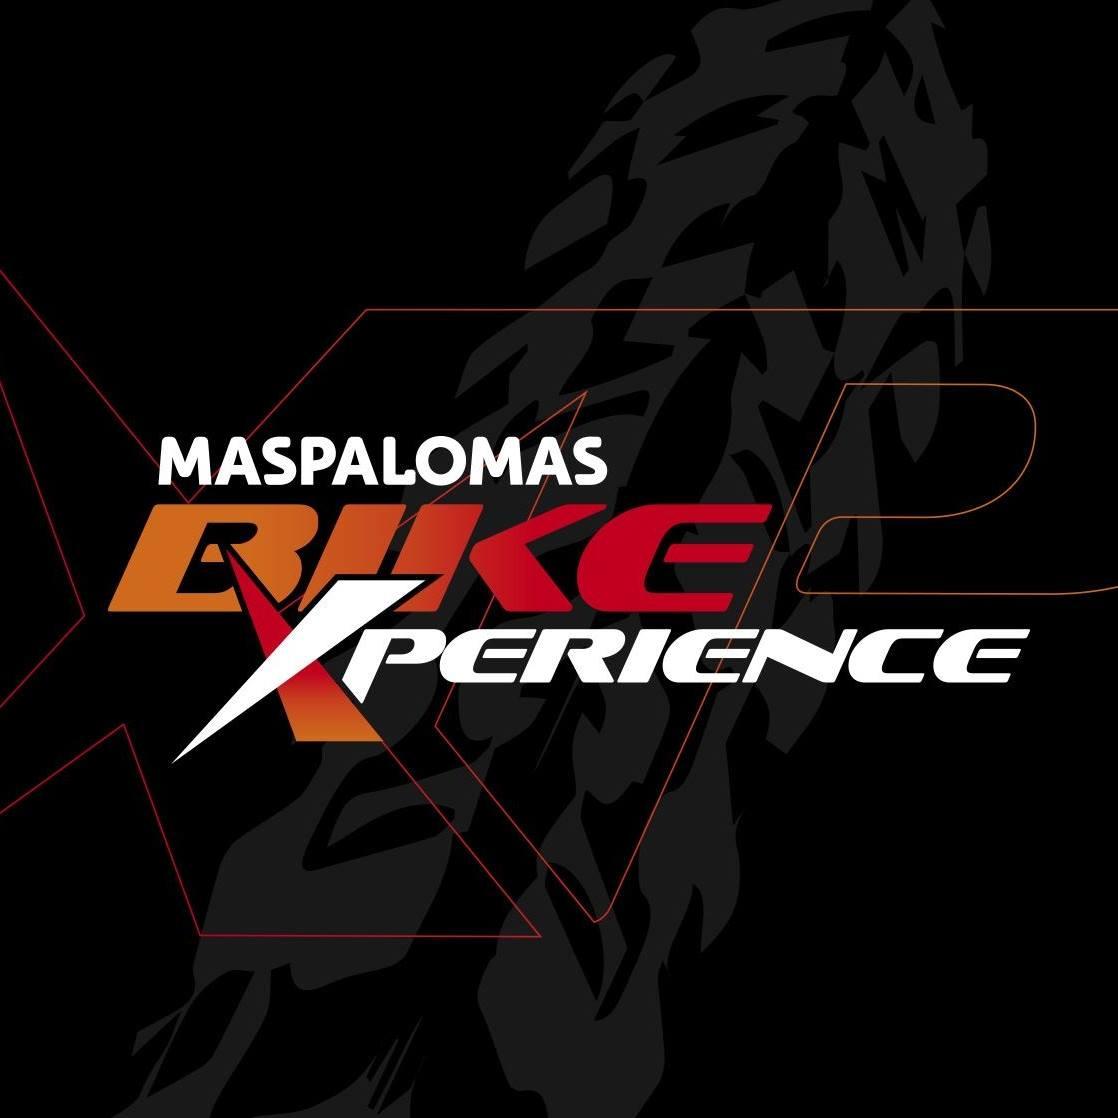 Maspalomas BikeXperience 2022